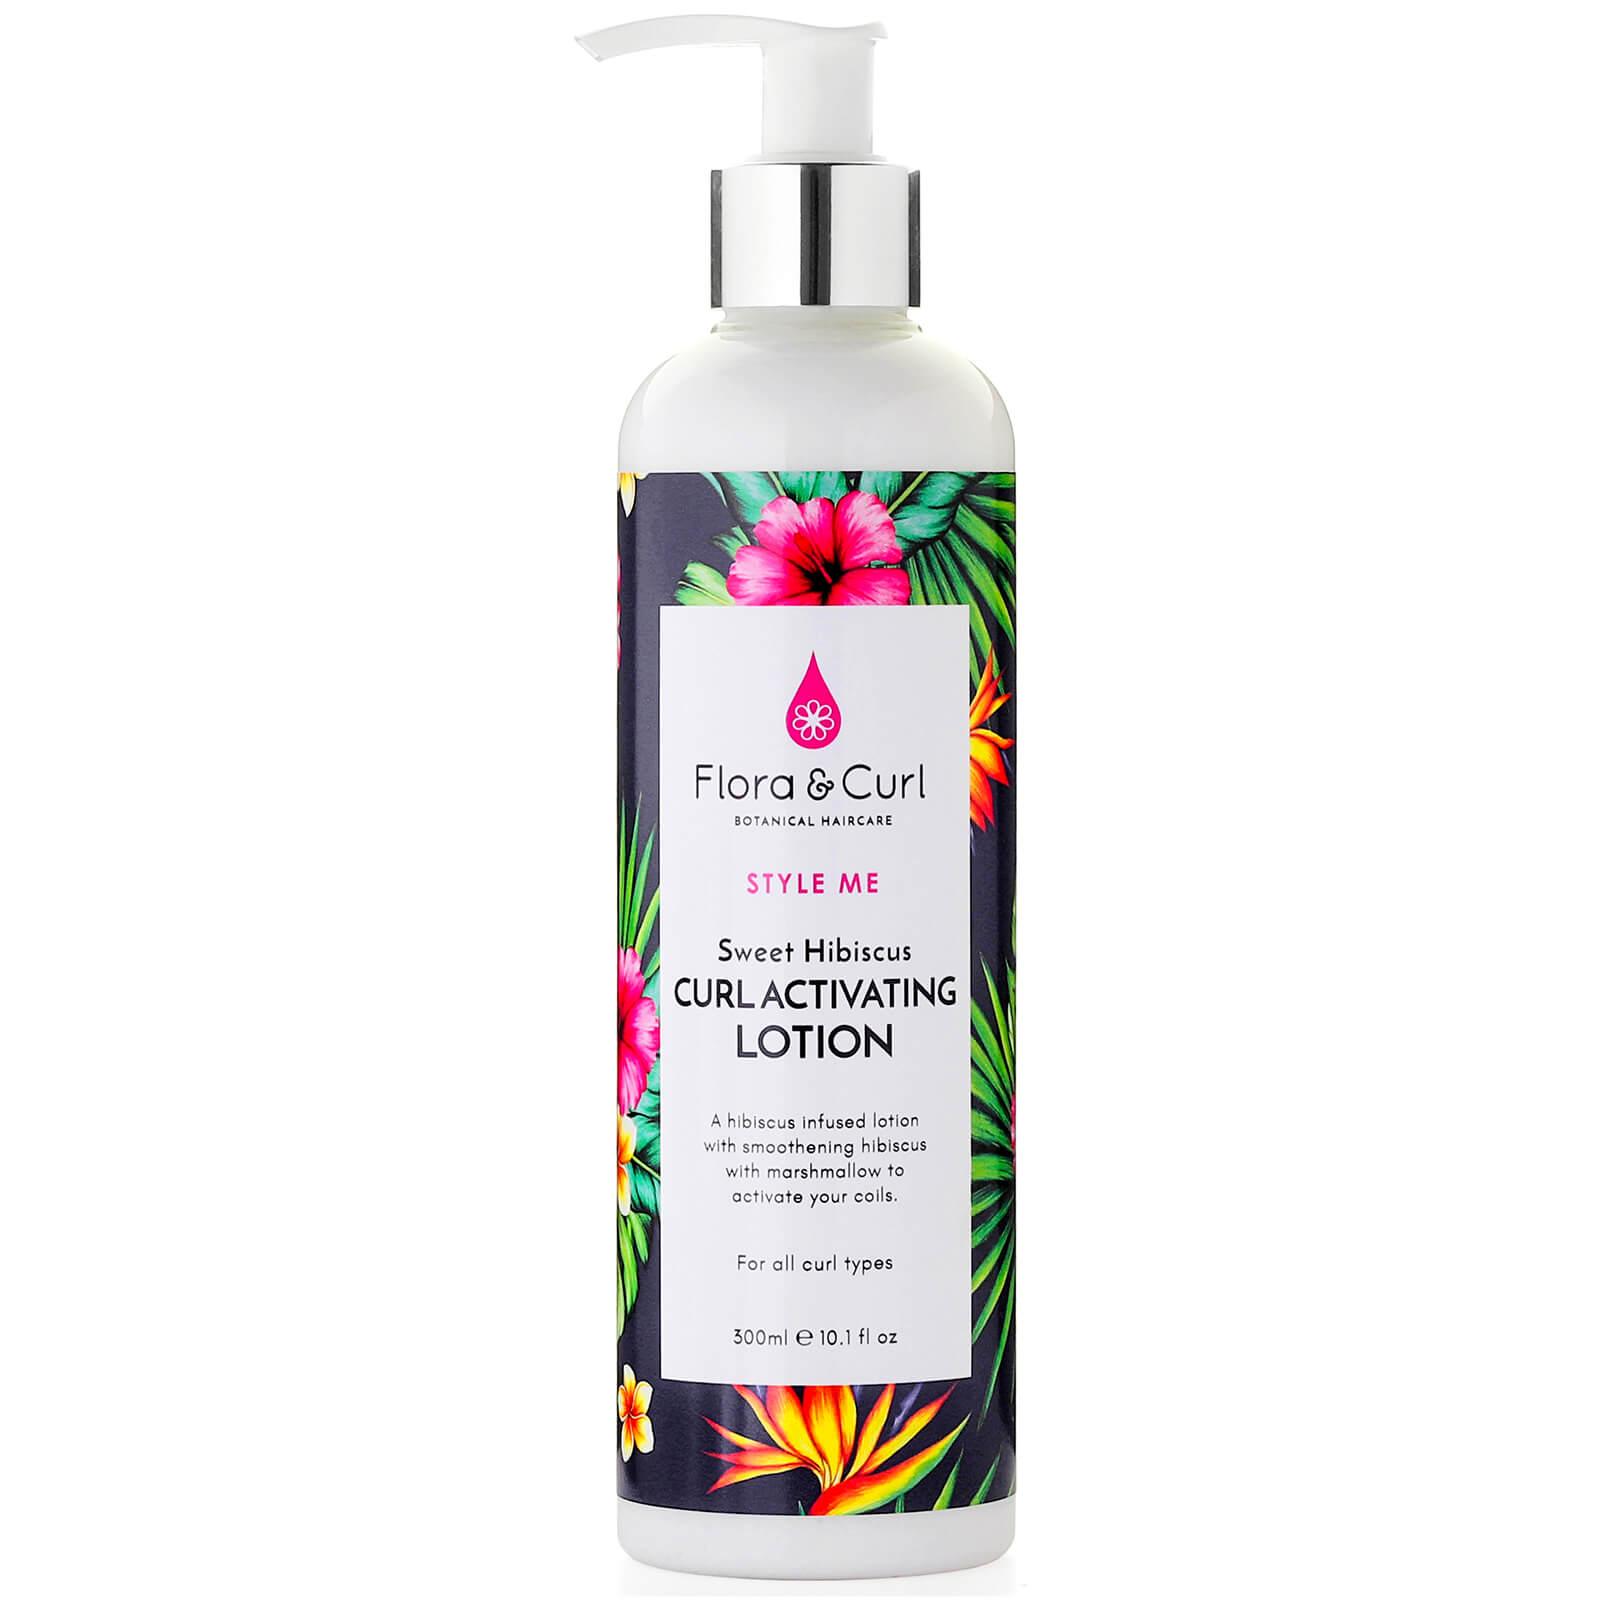 Купить Flora & Curl Sweet Hibiscus Curl Activating Lotion 300ml